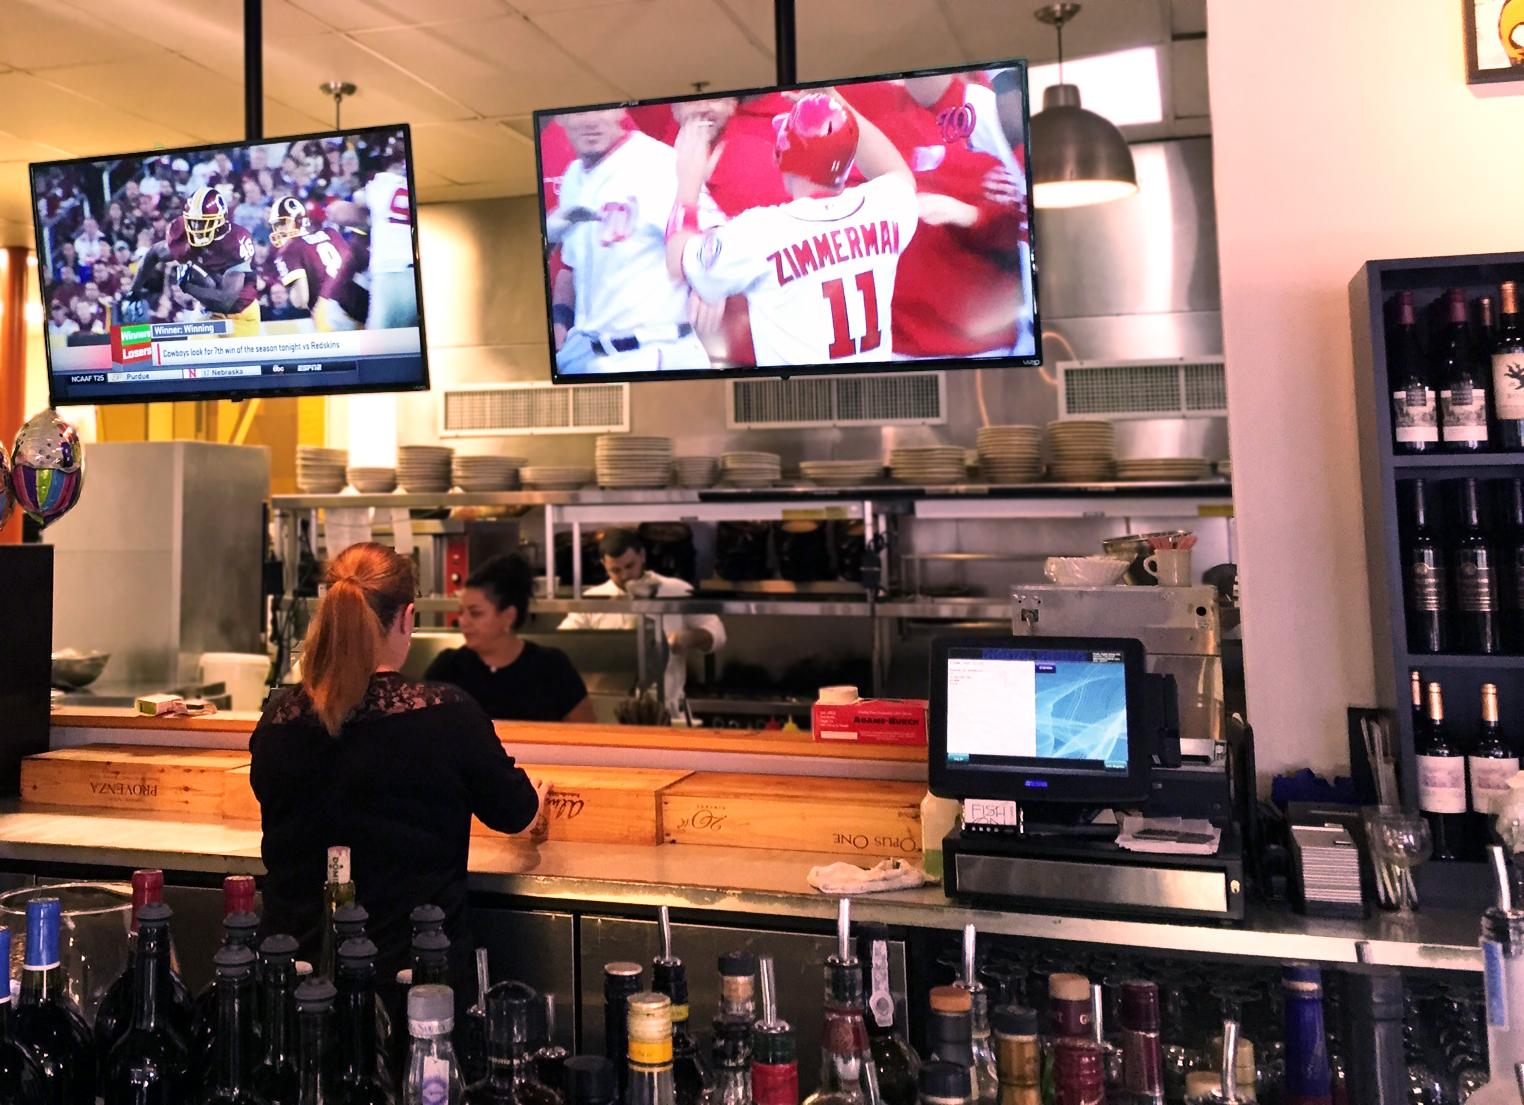 Taste of Italy TVs 3 copy